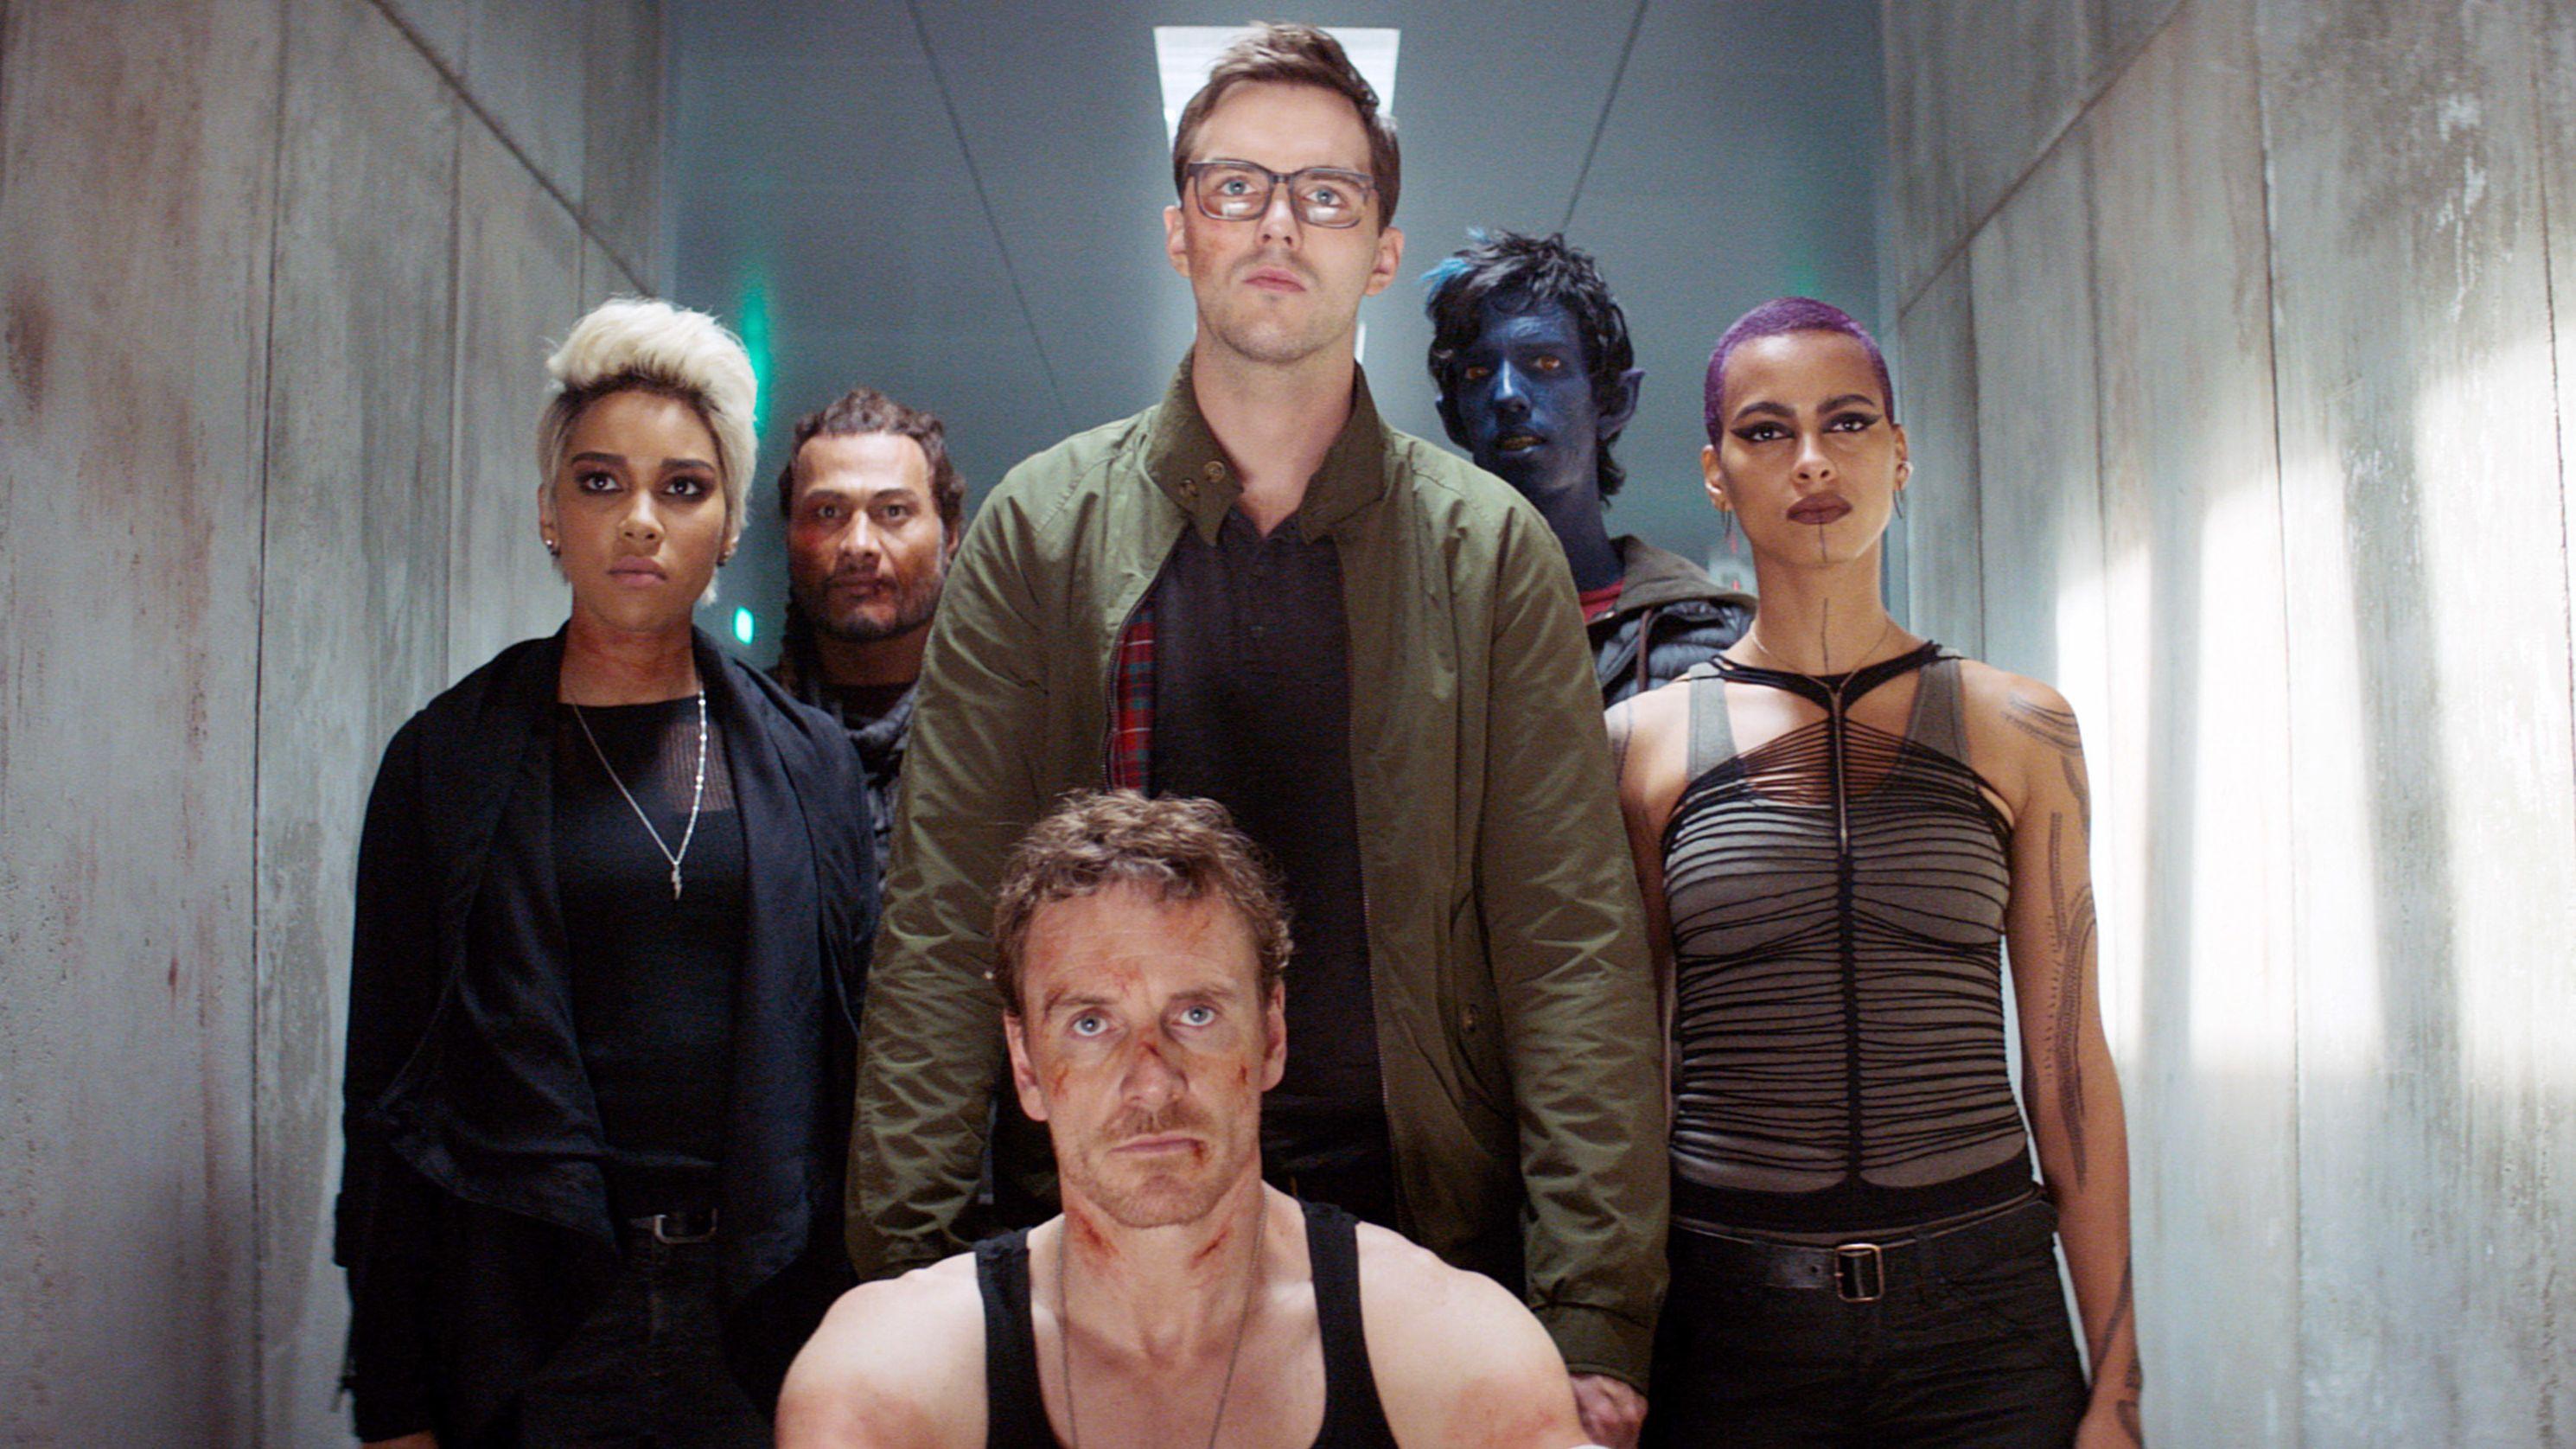 Sechs Schauspieler aus dem X-Men-Film